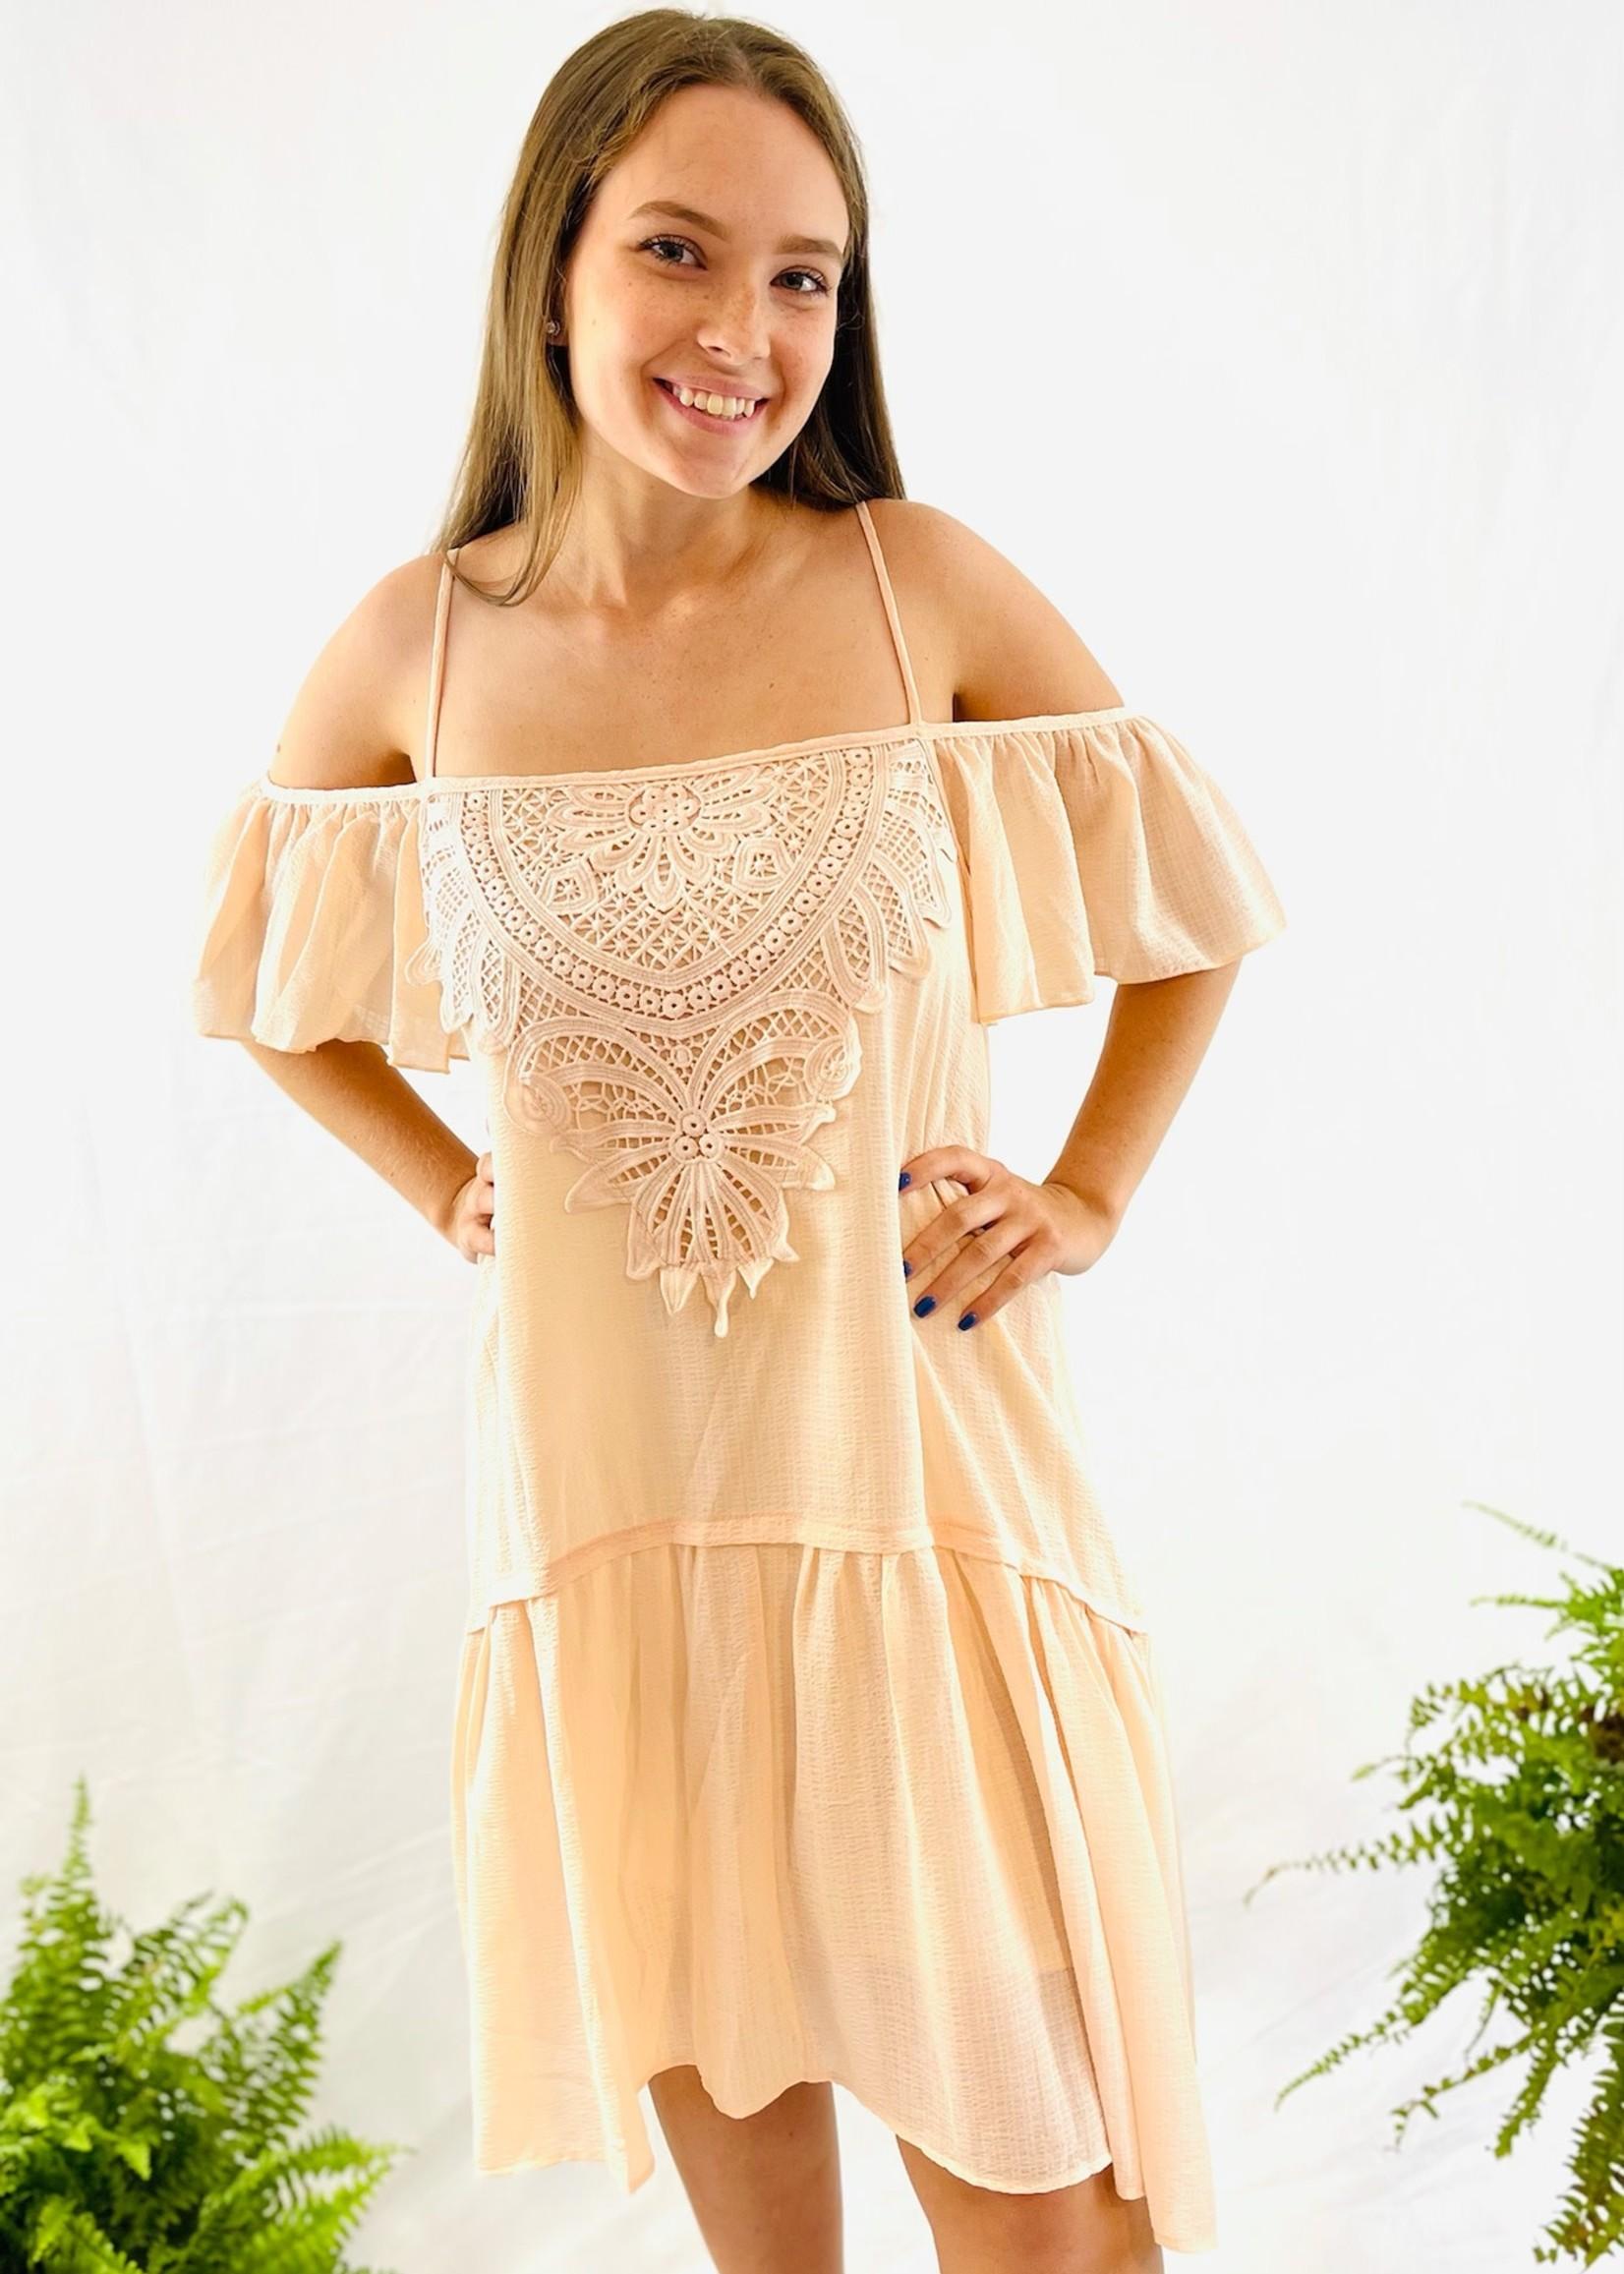 Crochet Spaghetti Strap Dress